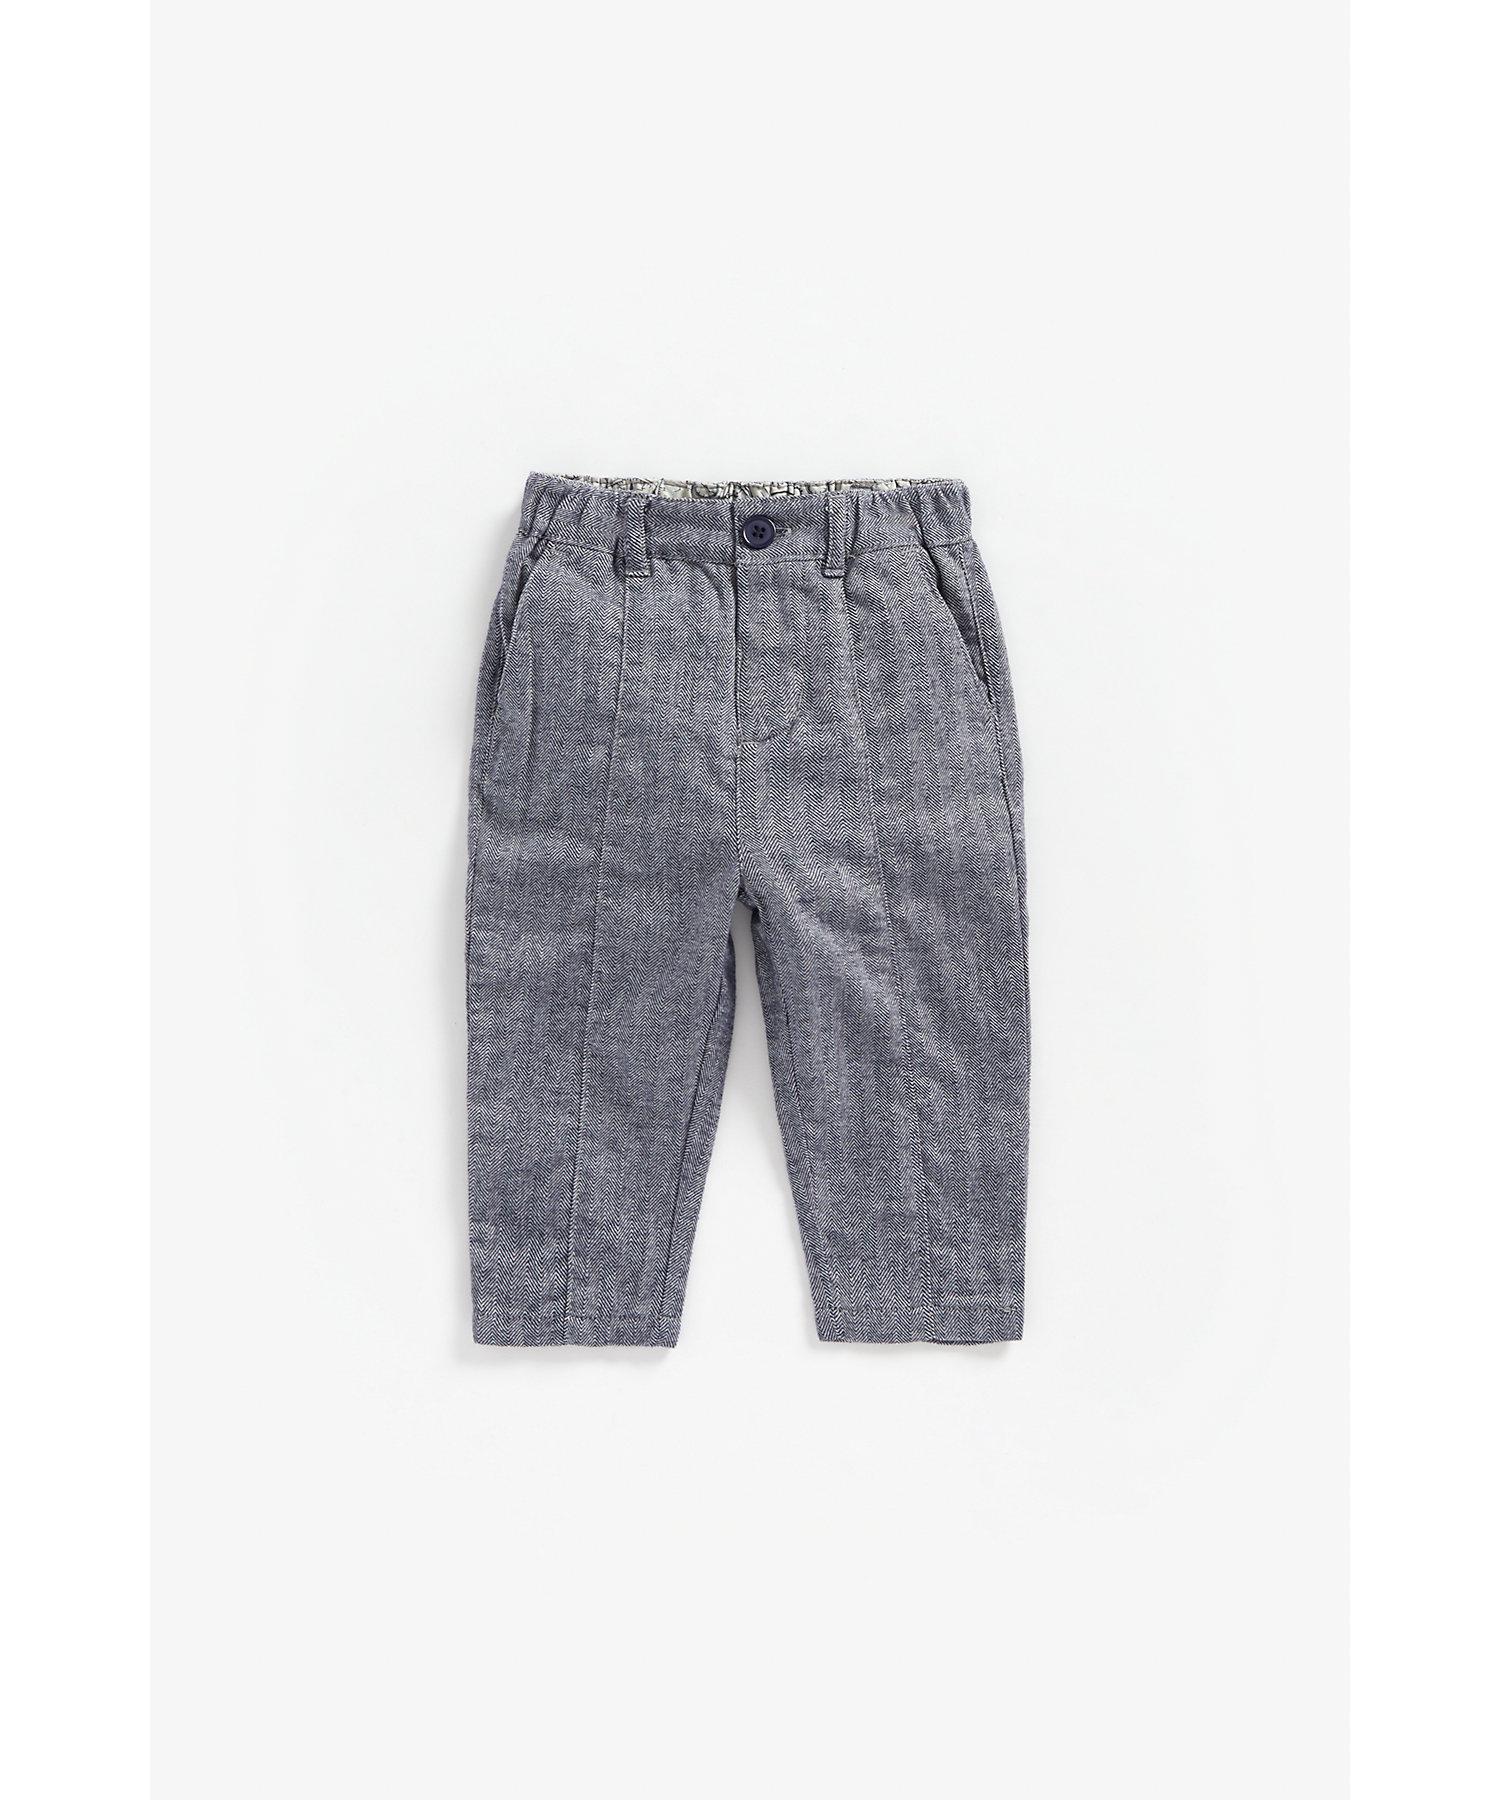 Mothercare | Boys Herringbone Trousers - Blue